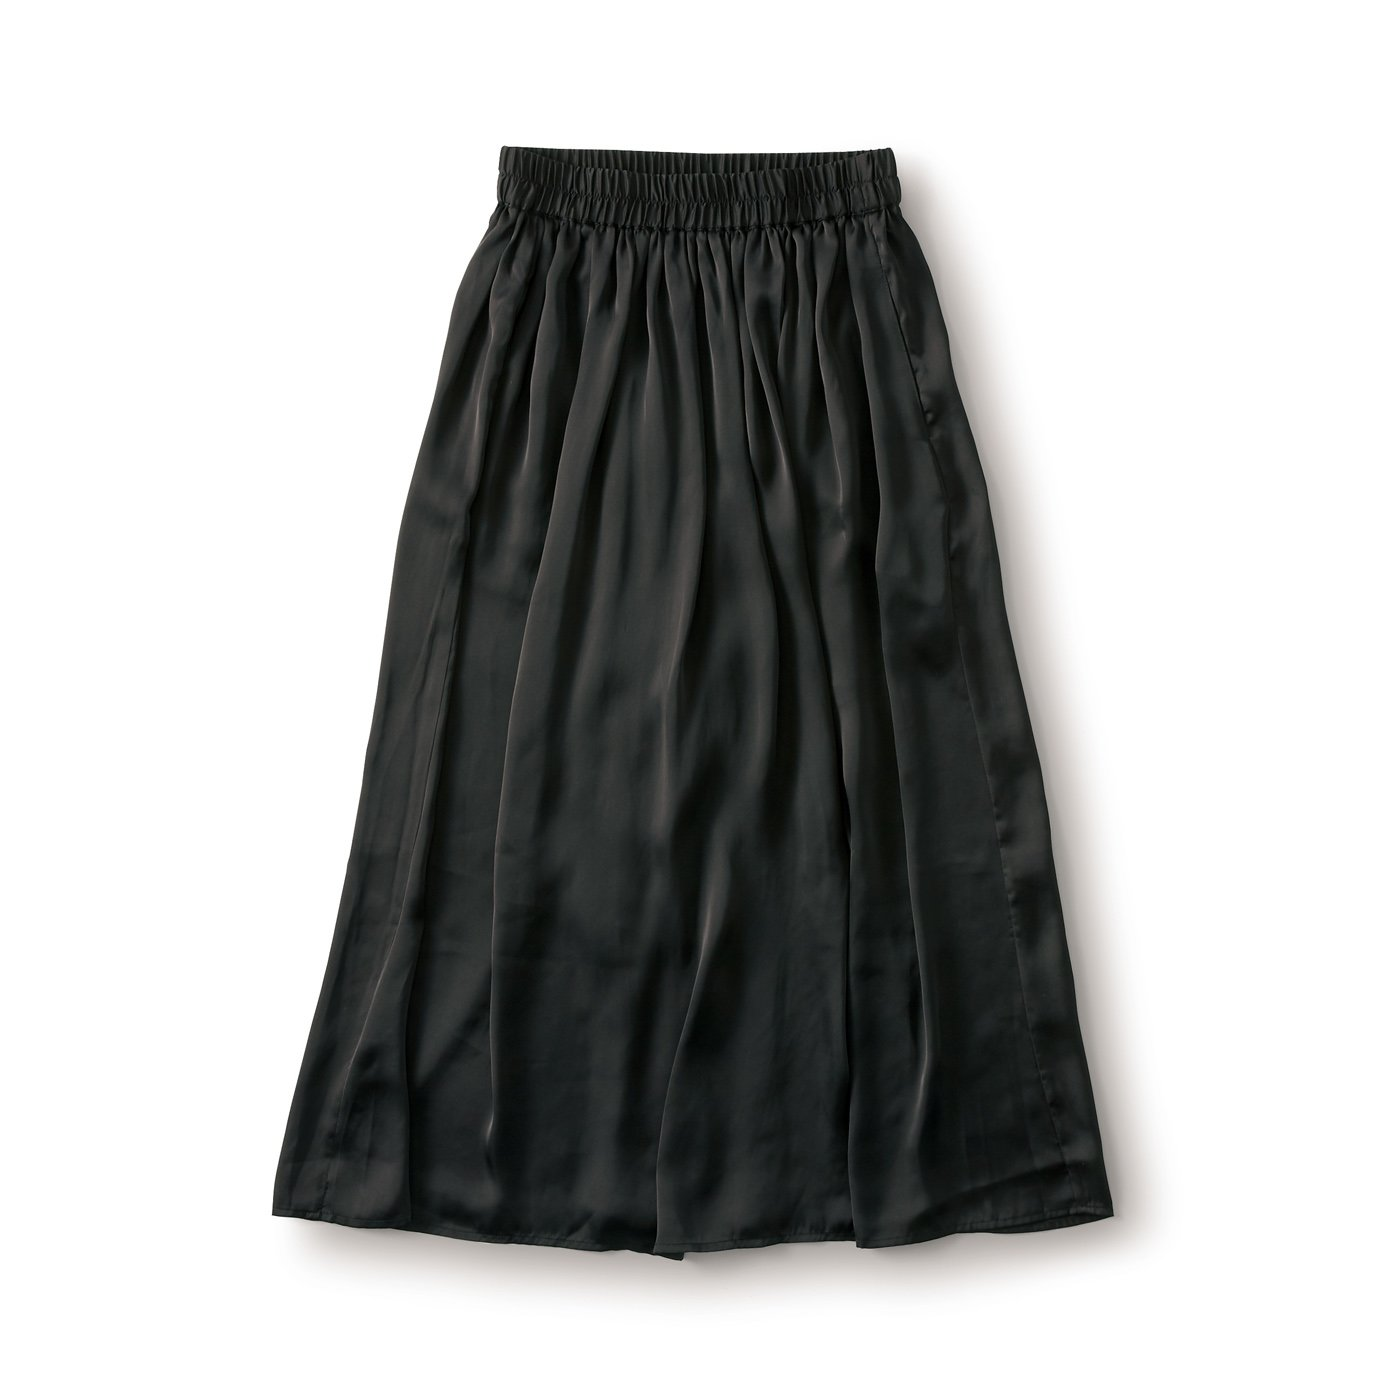 and myera さらりサテンスカート〈黒〉